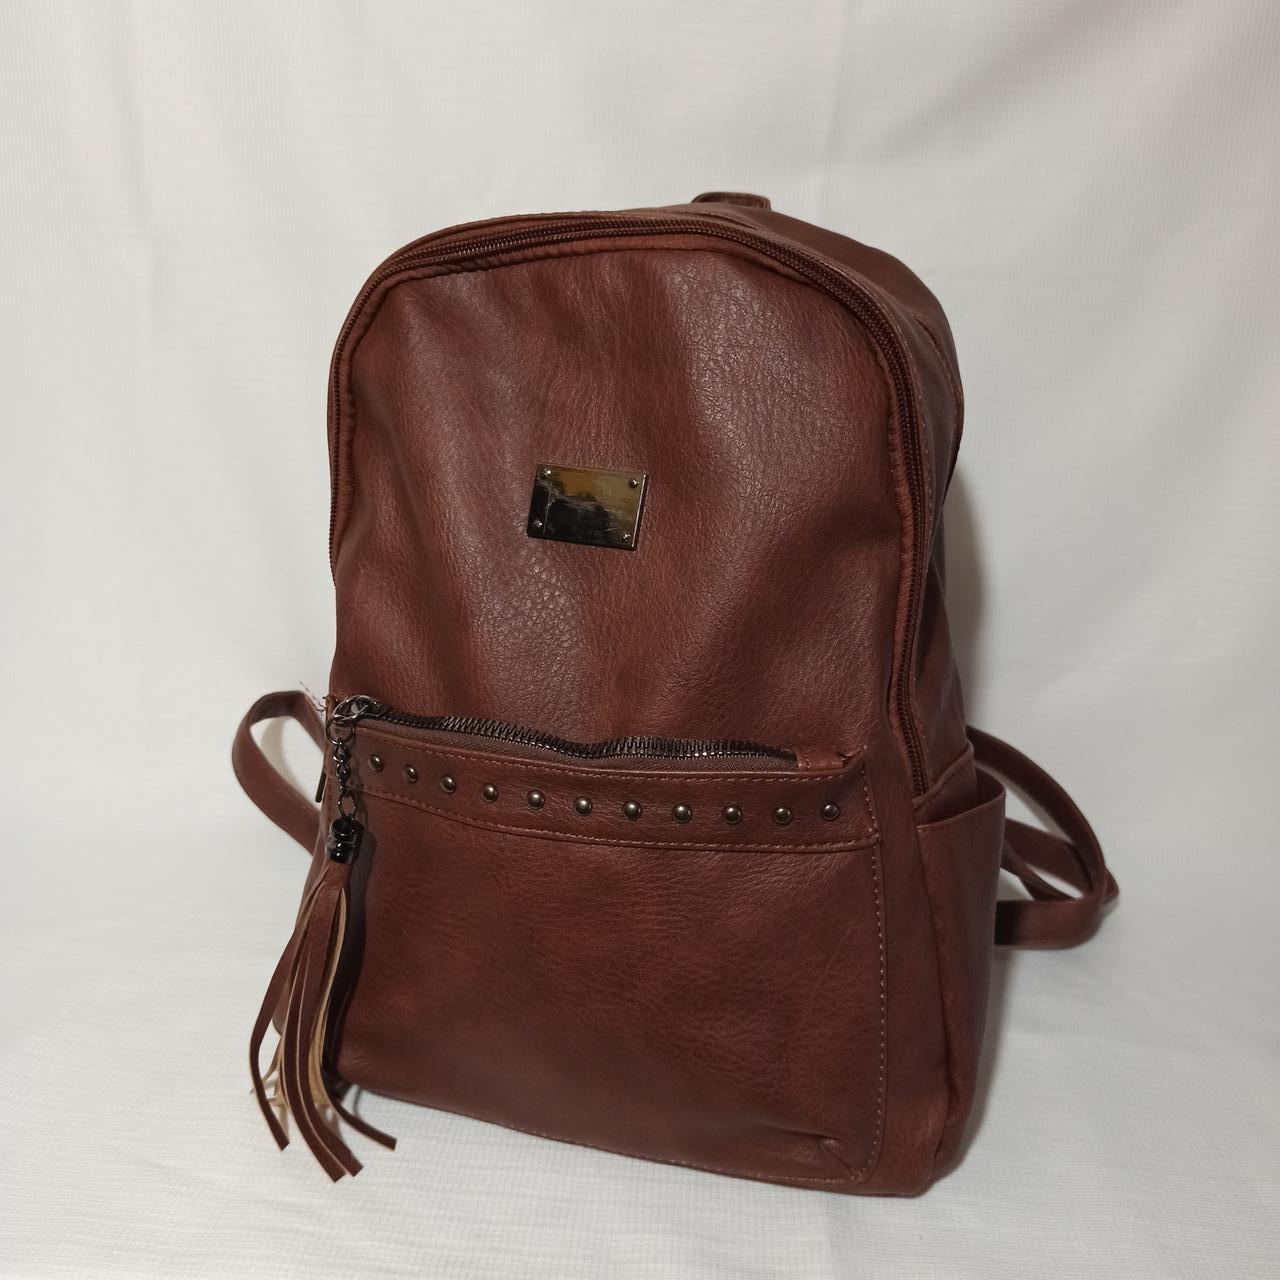 Жіночий рюкзак / Женский рюкзак 11449